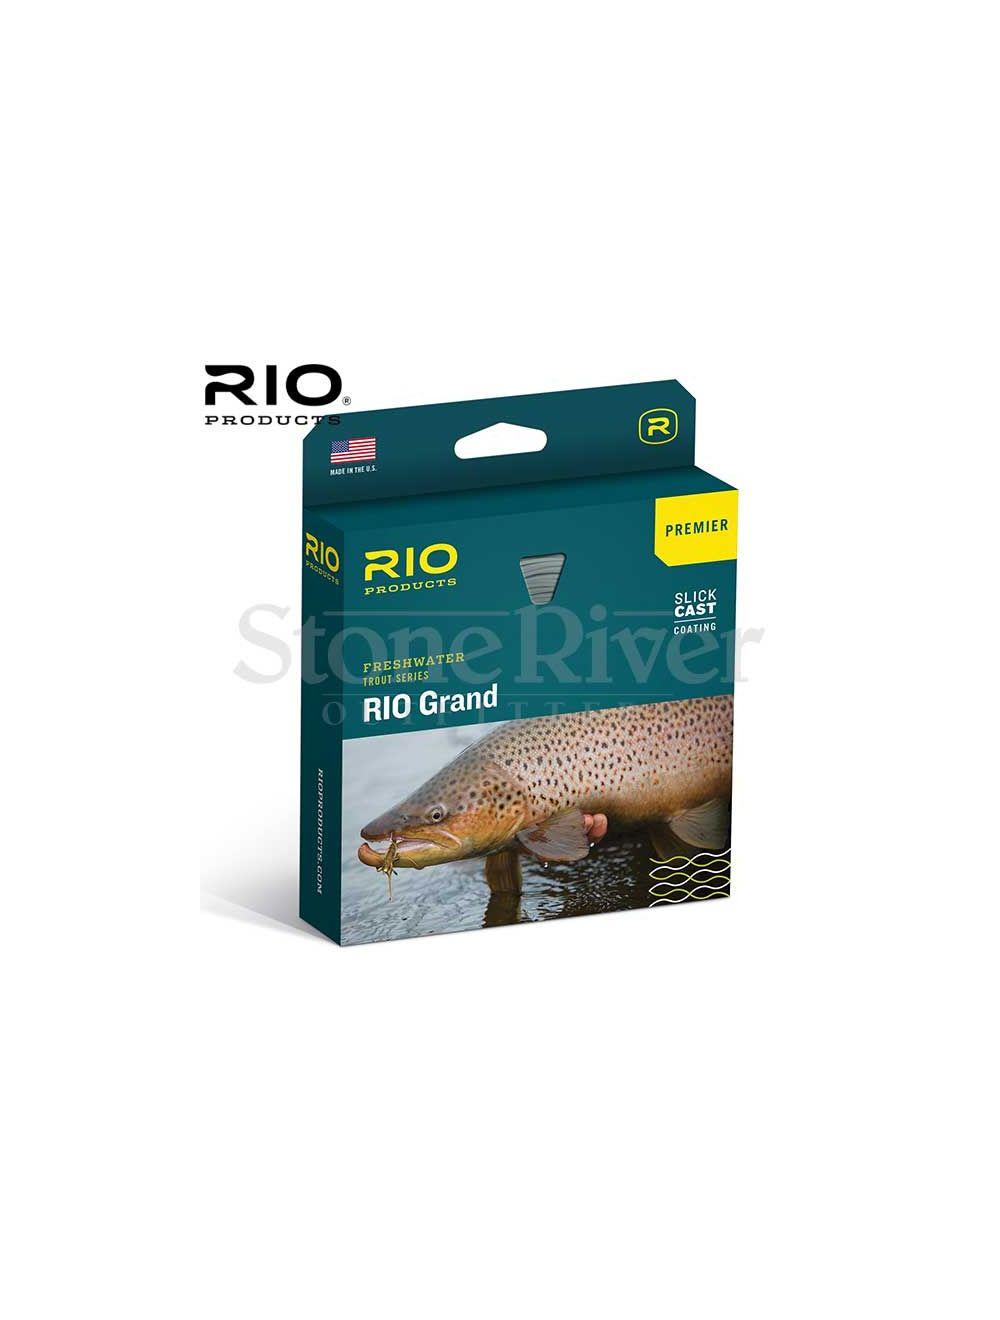 Rio Premier Rio Grand Slick Cast Fly Line